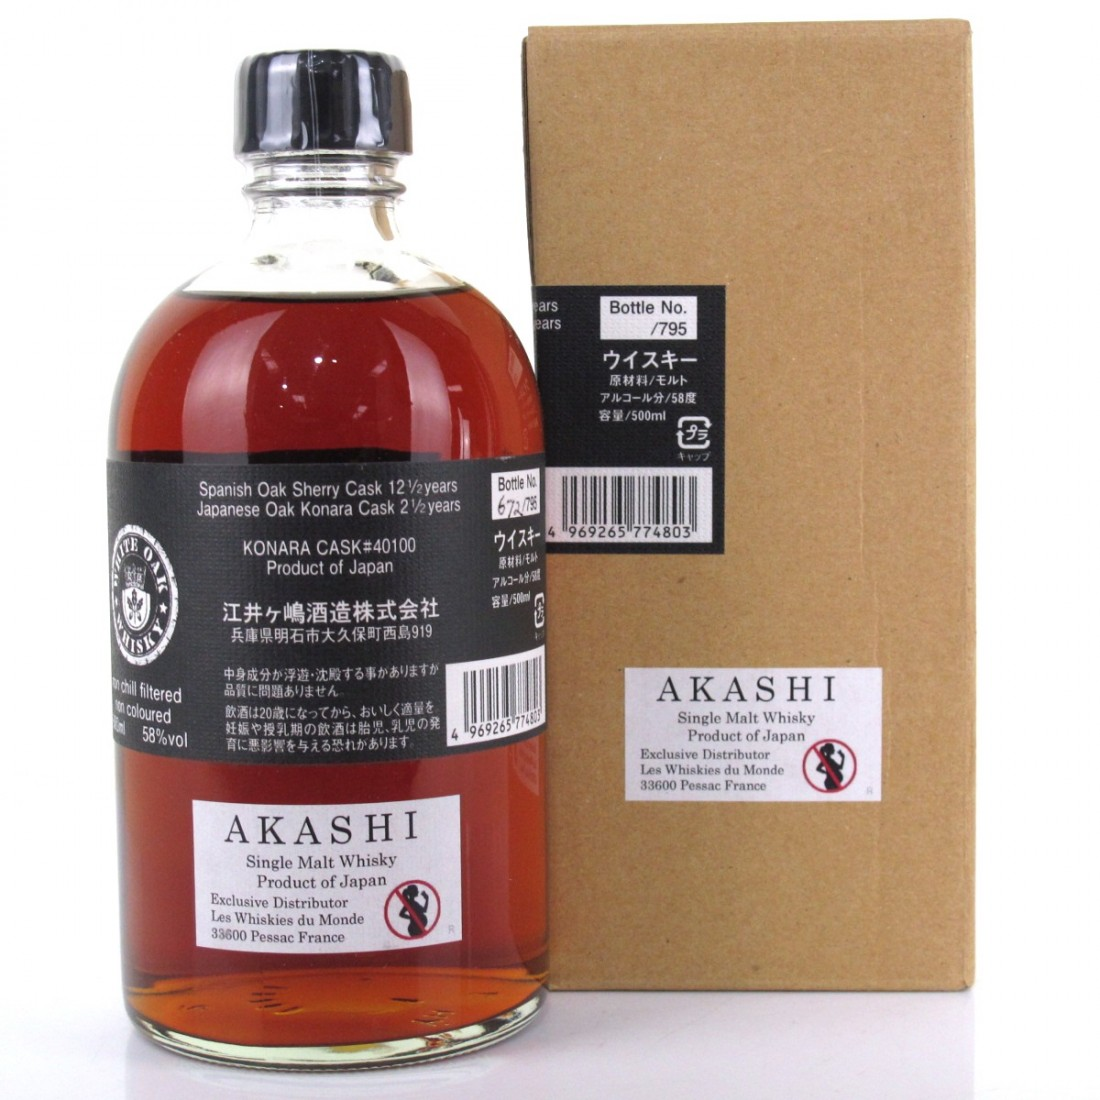 Eigashima Akashi White Oak 15 Year Old Single Konara Cask #40100